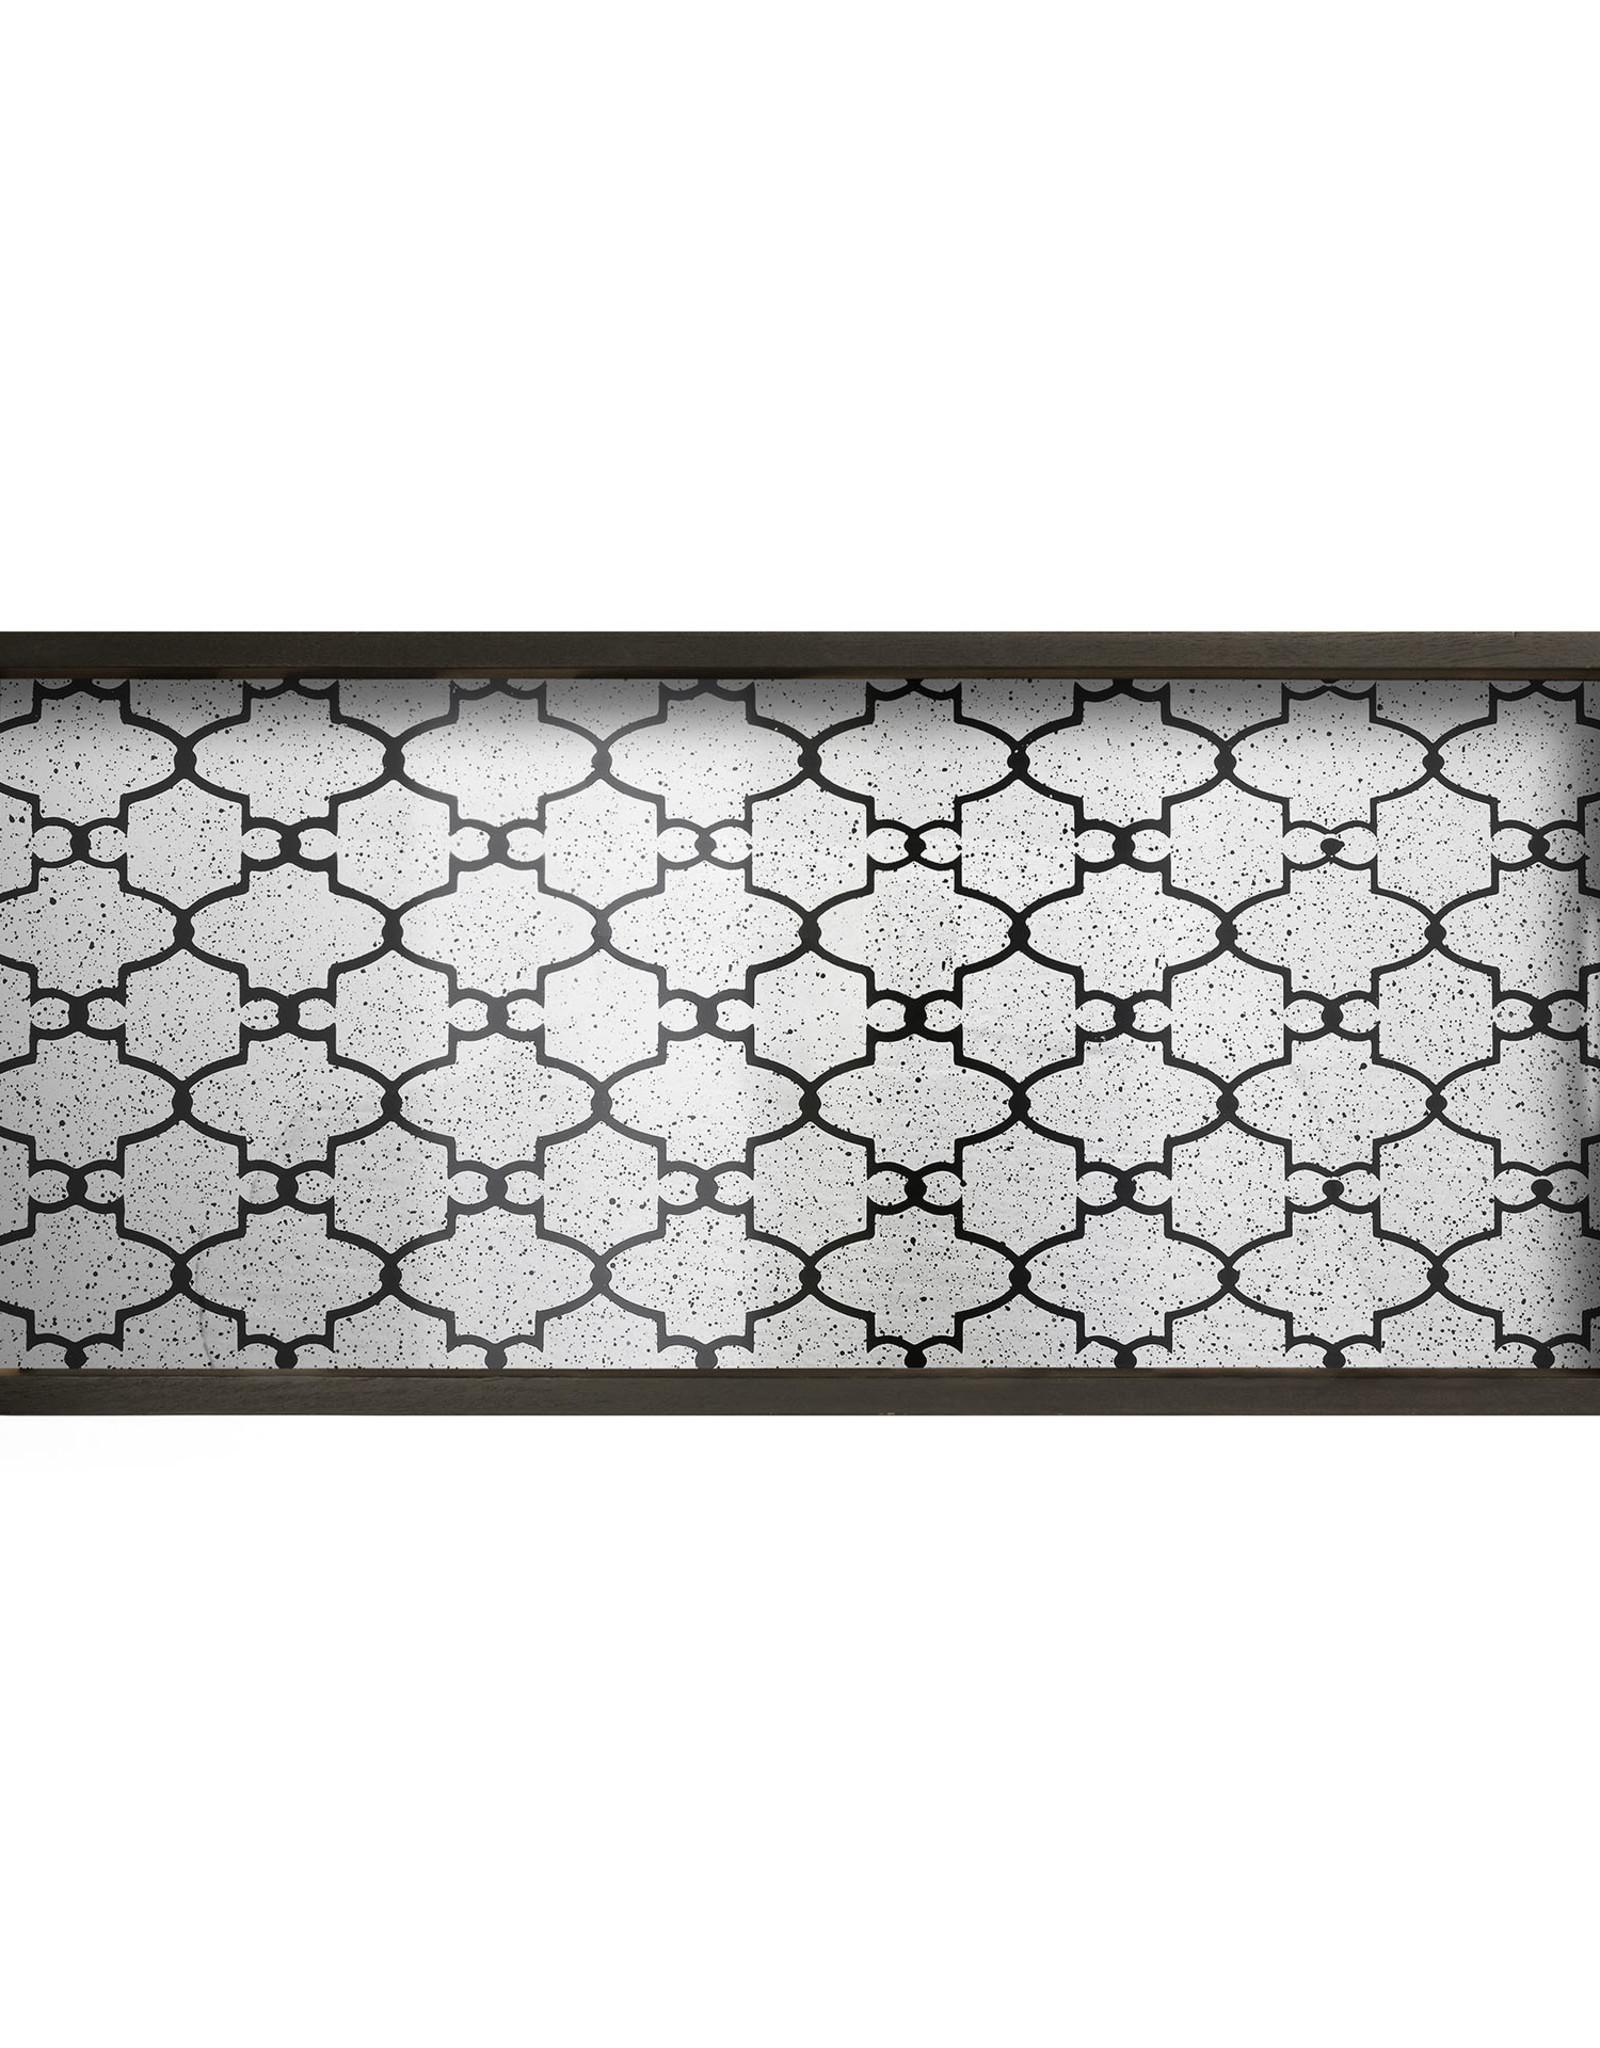 Bronze Gate mirror tray - rectangular - M 27 x 12 x 2